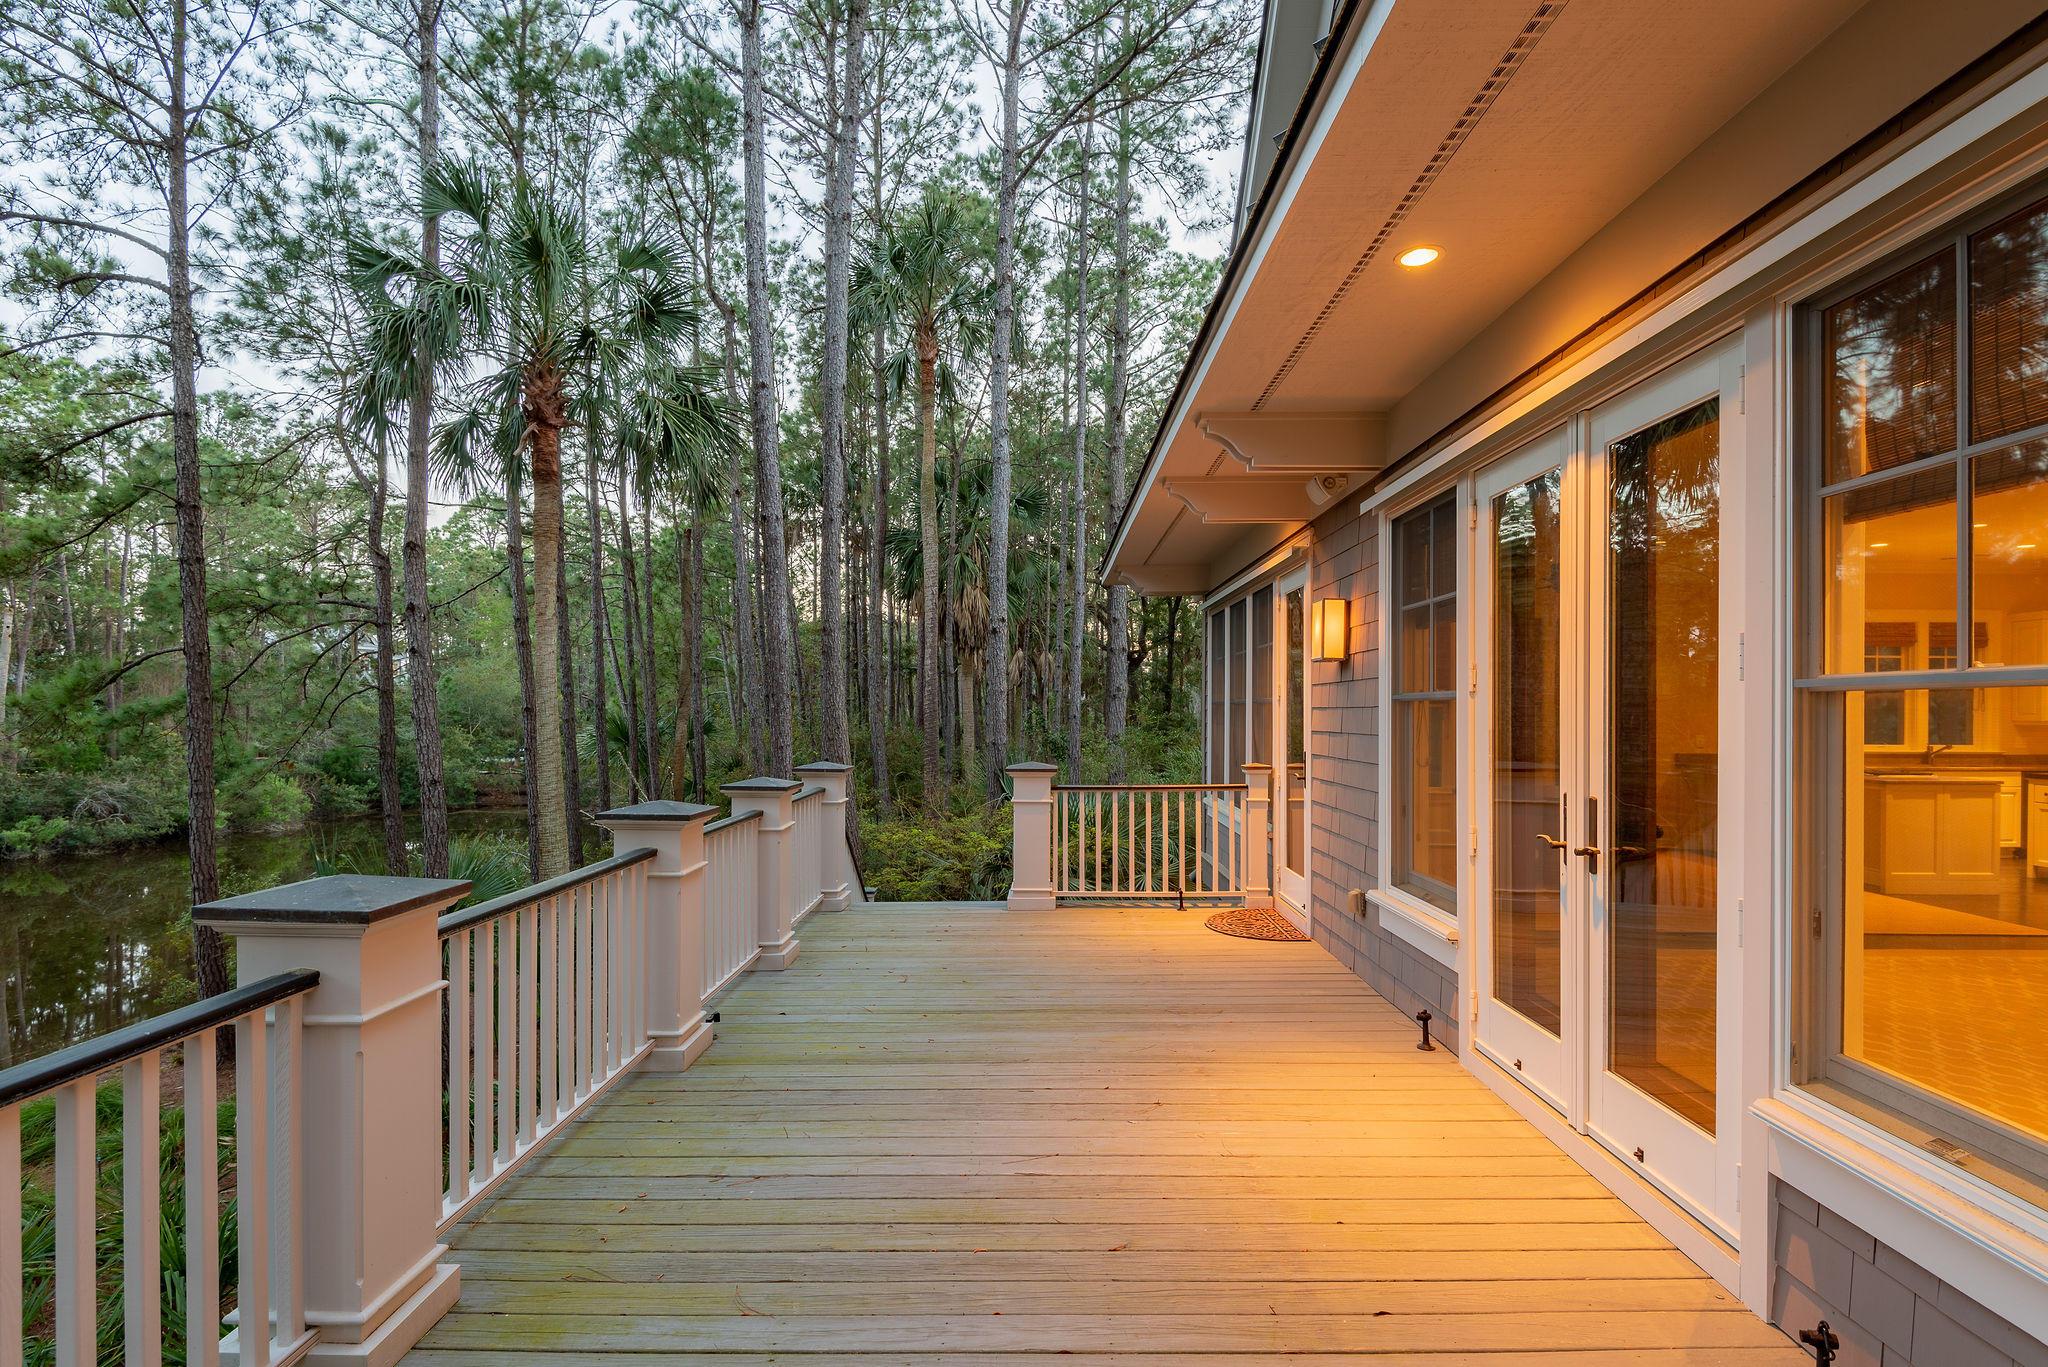 Kiawah Island Homes For Sale - 3 Grey Widgeon, Kiawah Island, SC - 74